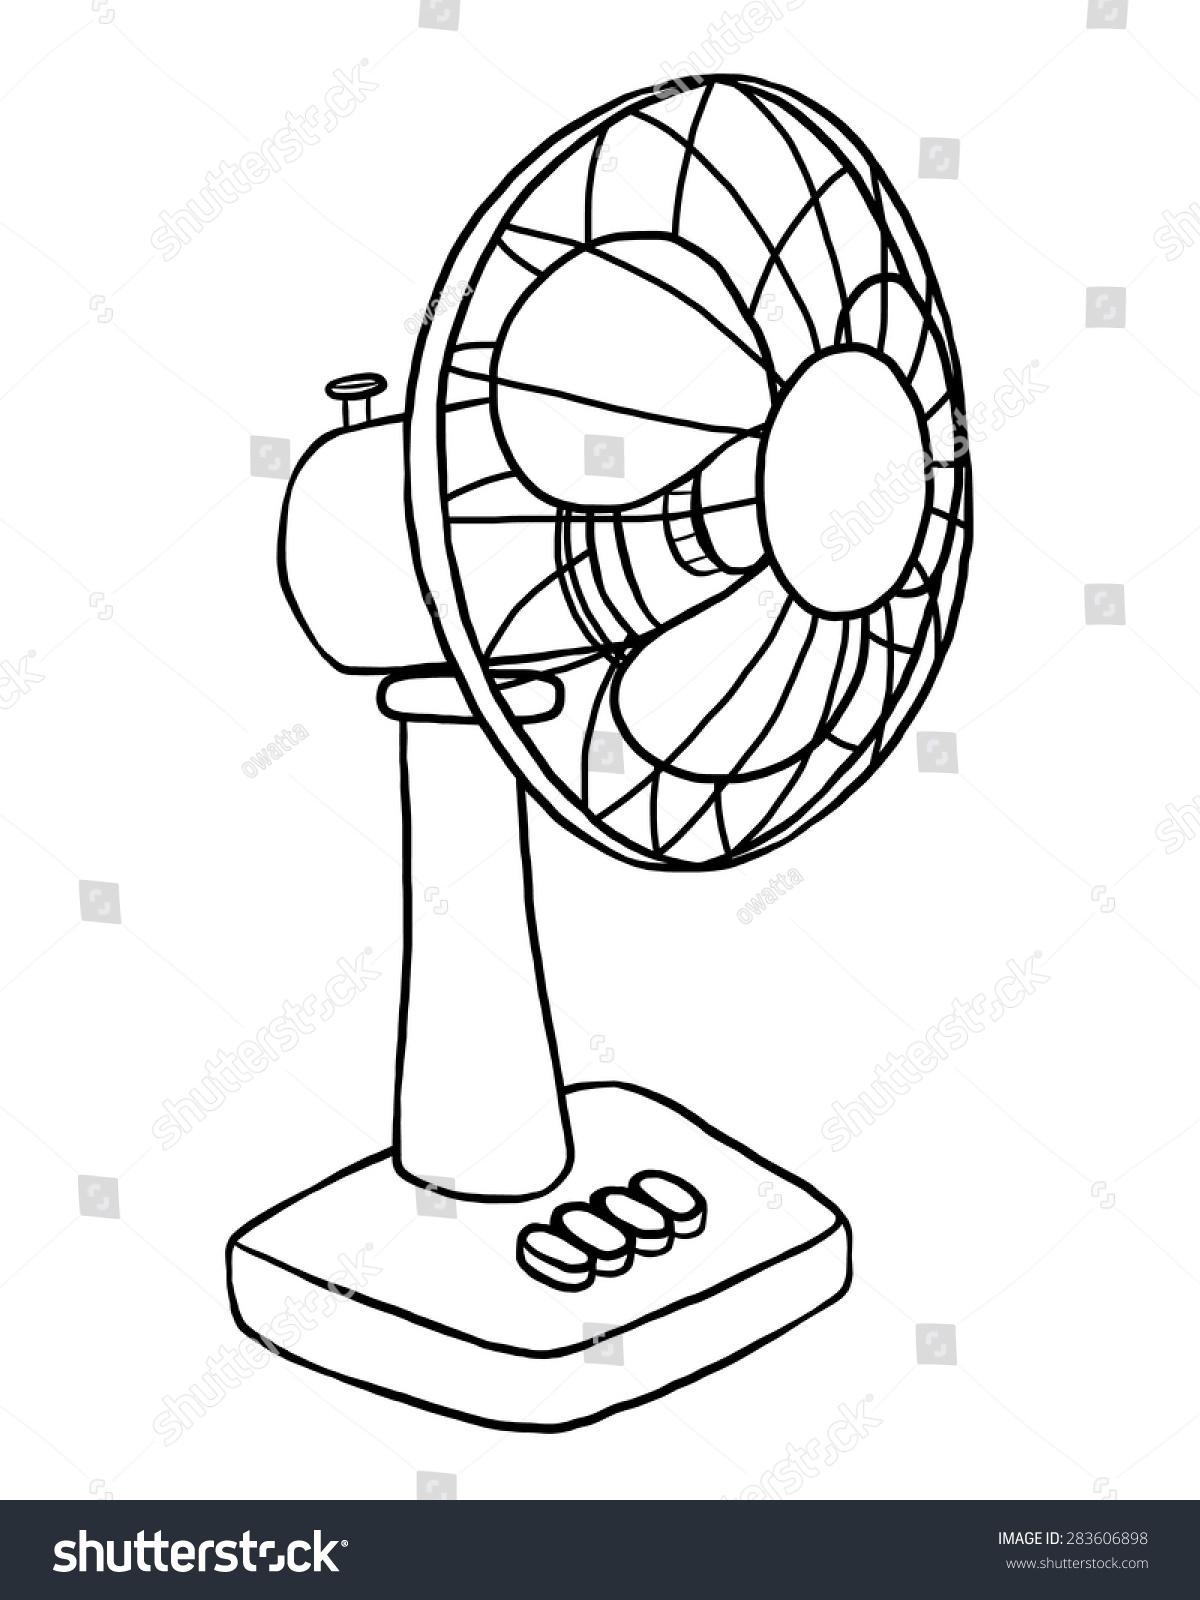 Electric Fan Cartoon : Electric fan cartoon vector illustration black stock